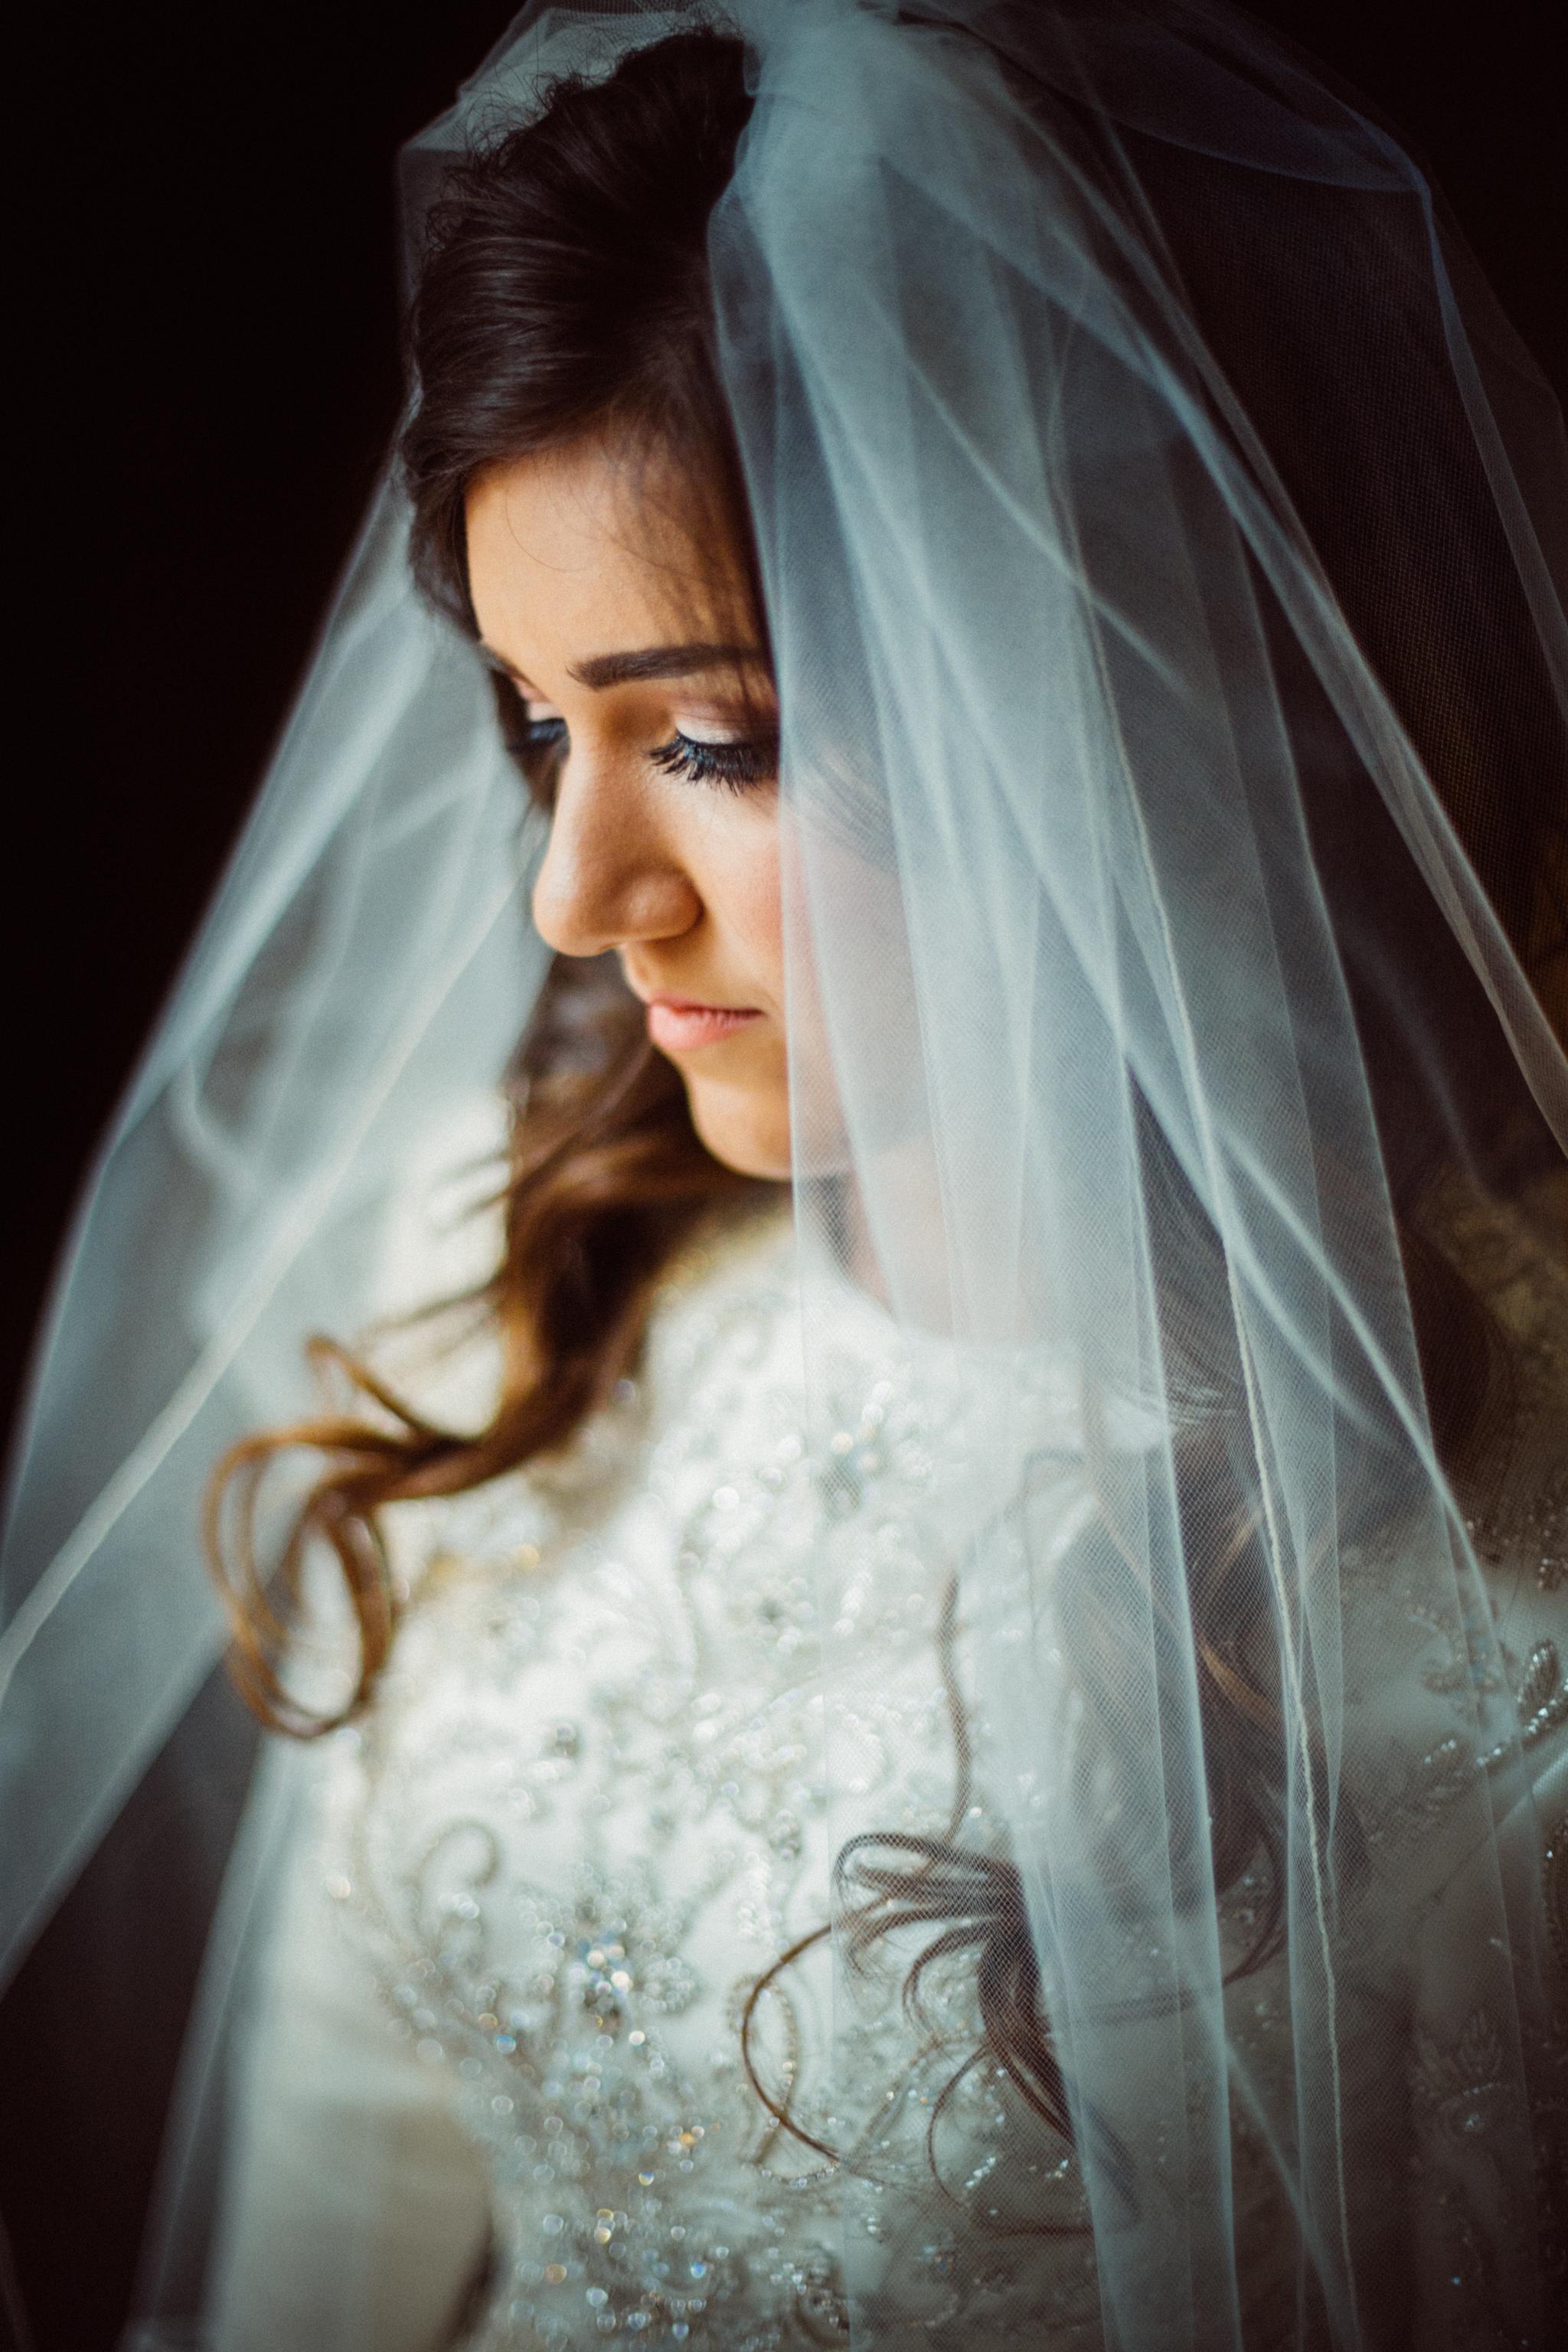 Wedding Iossi and Gitty Khafif  - Eliau Piha studio photography, new york, events, people 770 brooklyn -0063.jpg